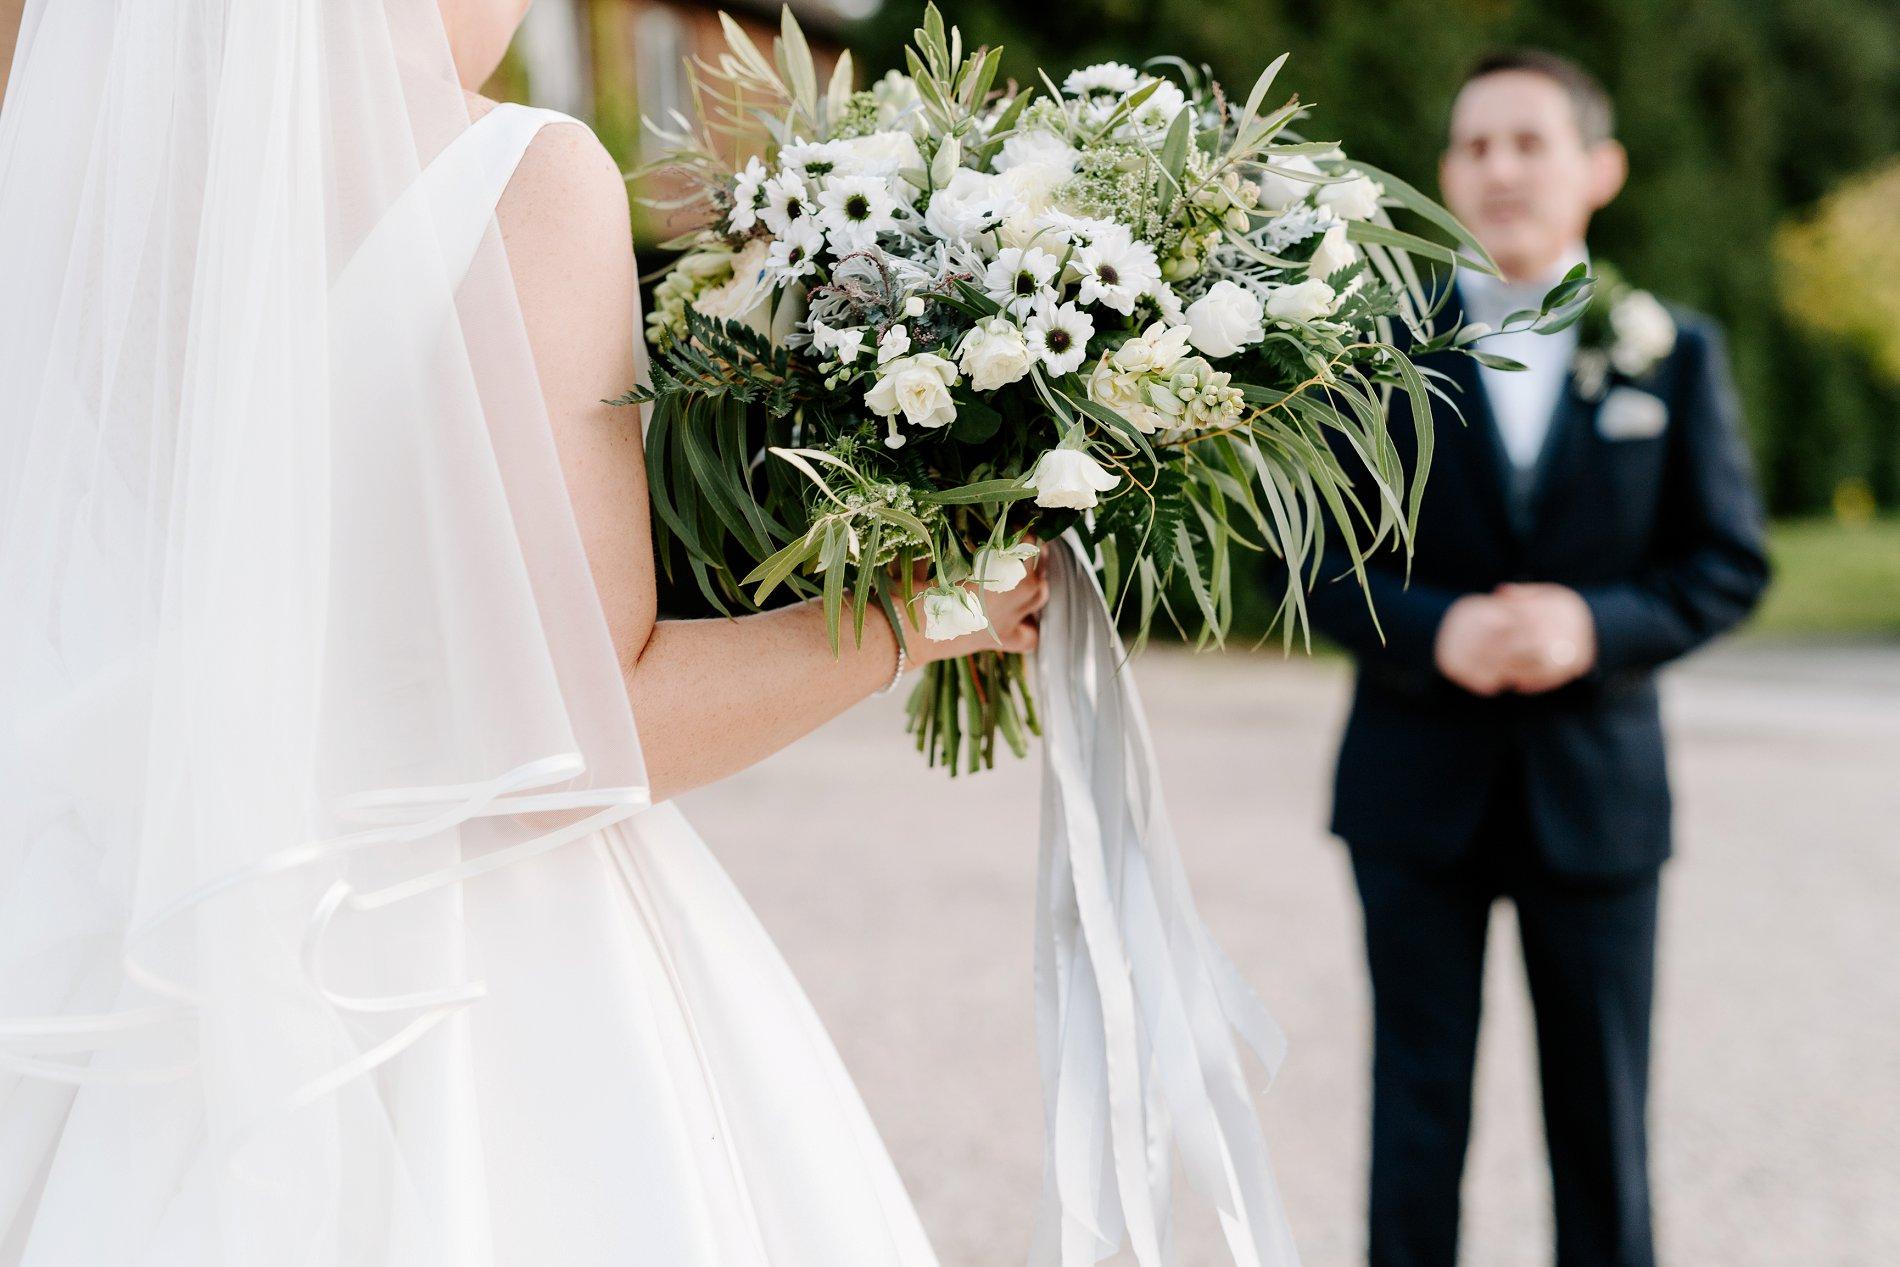 An Elegant White Wedding at Thicket Priory (c) Carla Whittingham Photography (81)